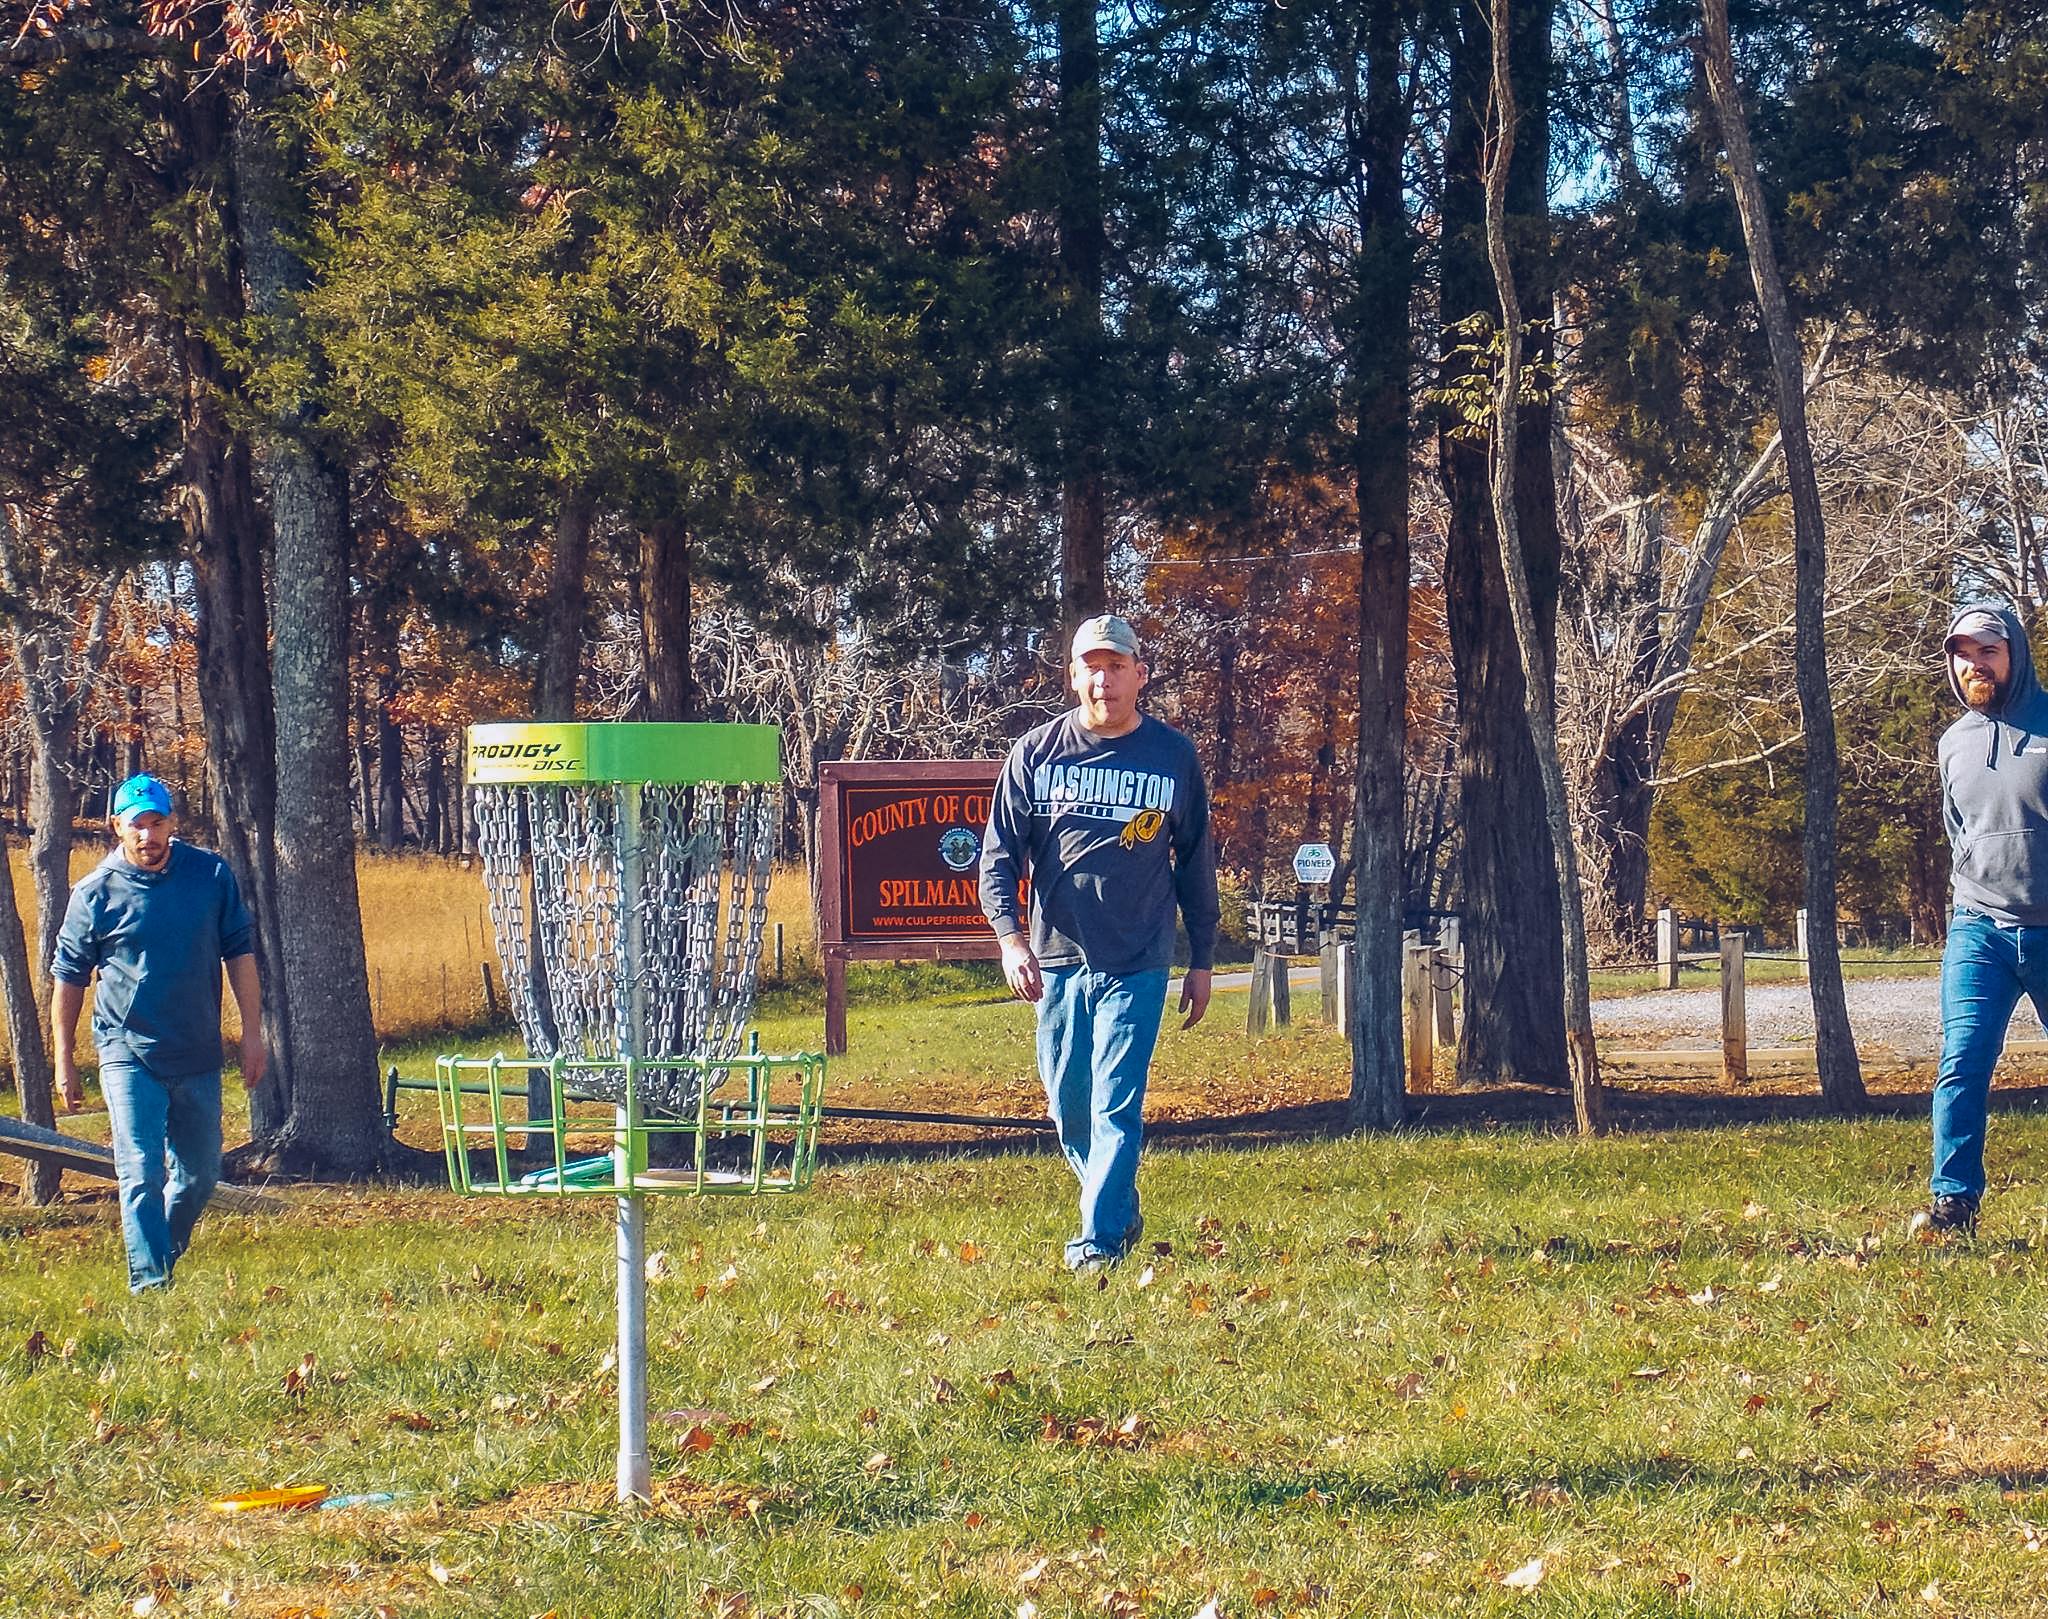 Photo from Mountain Run Disc Golf Club Facebook